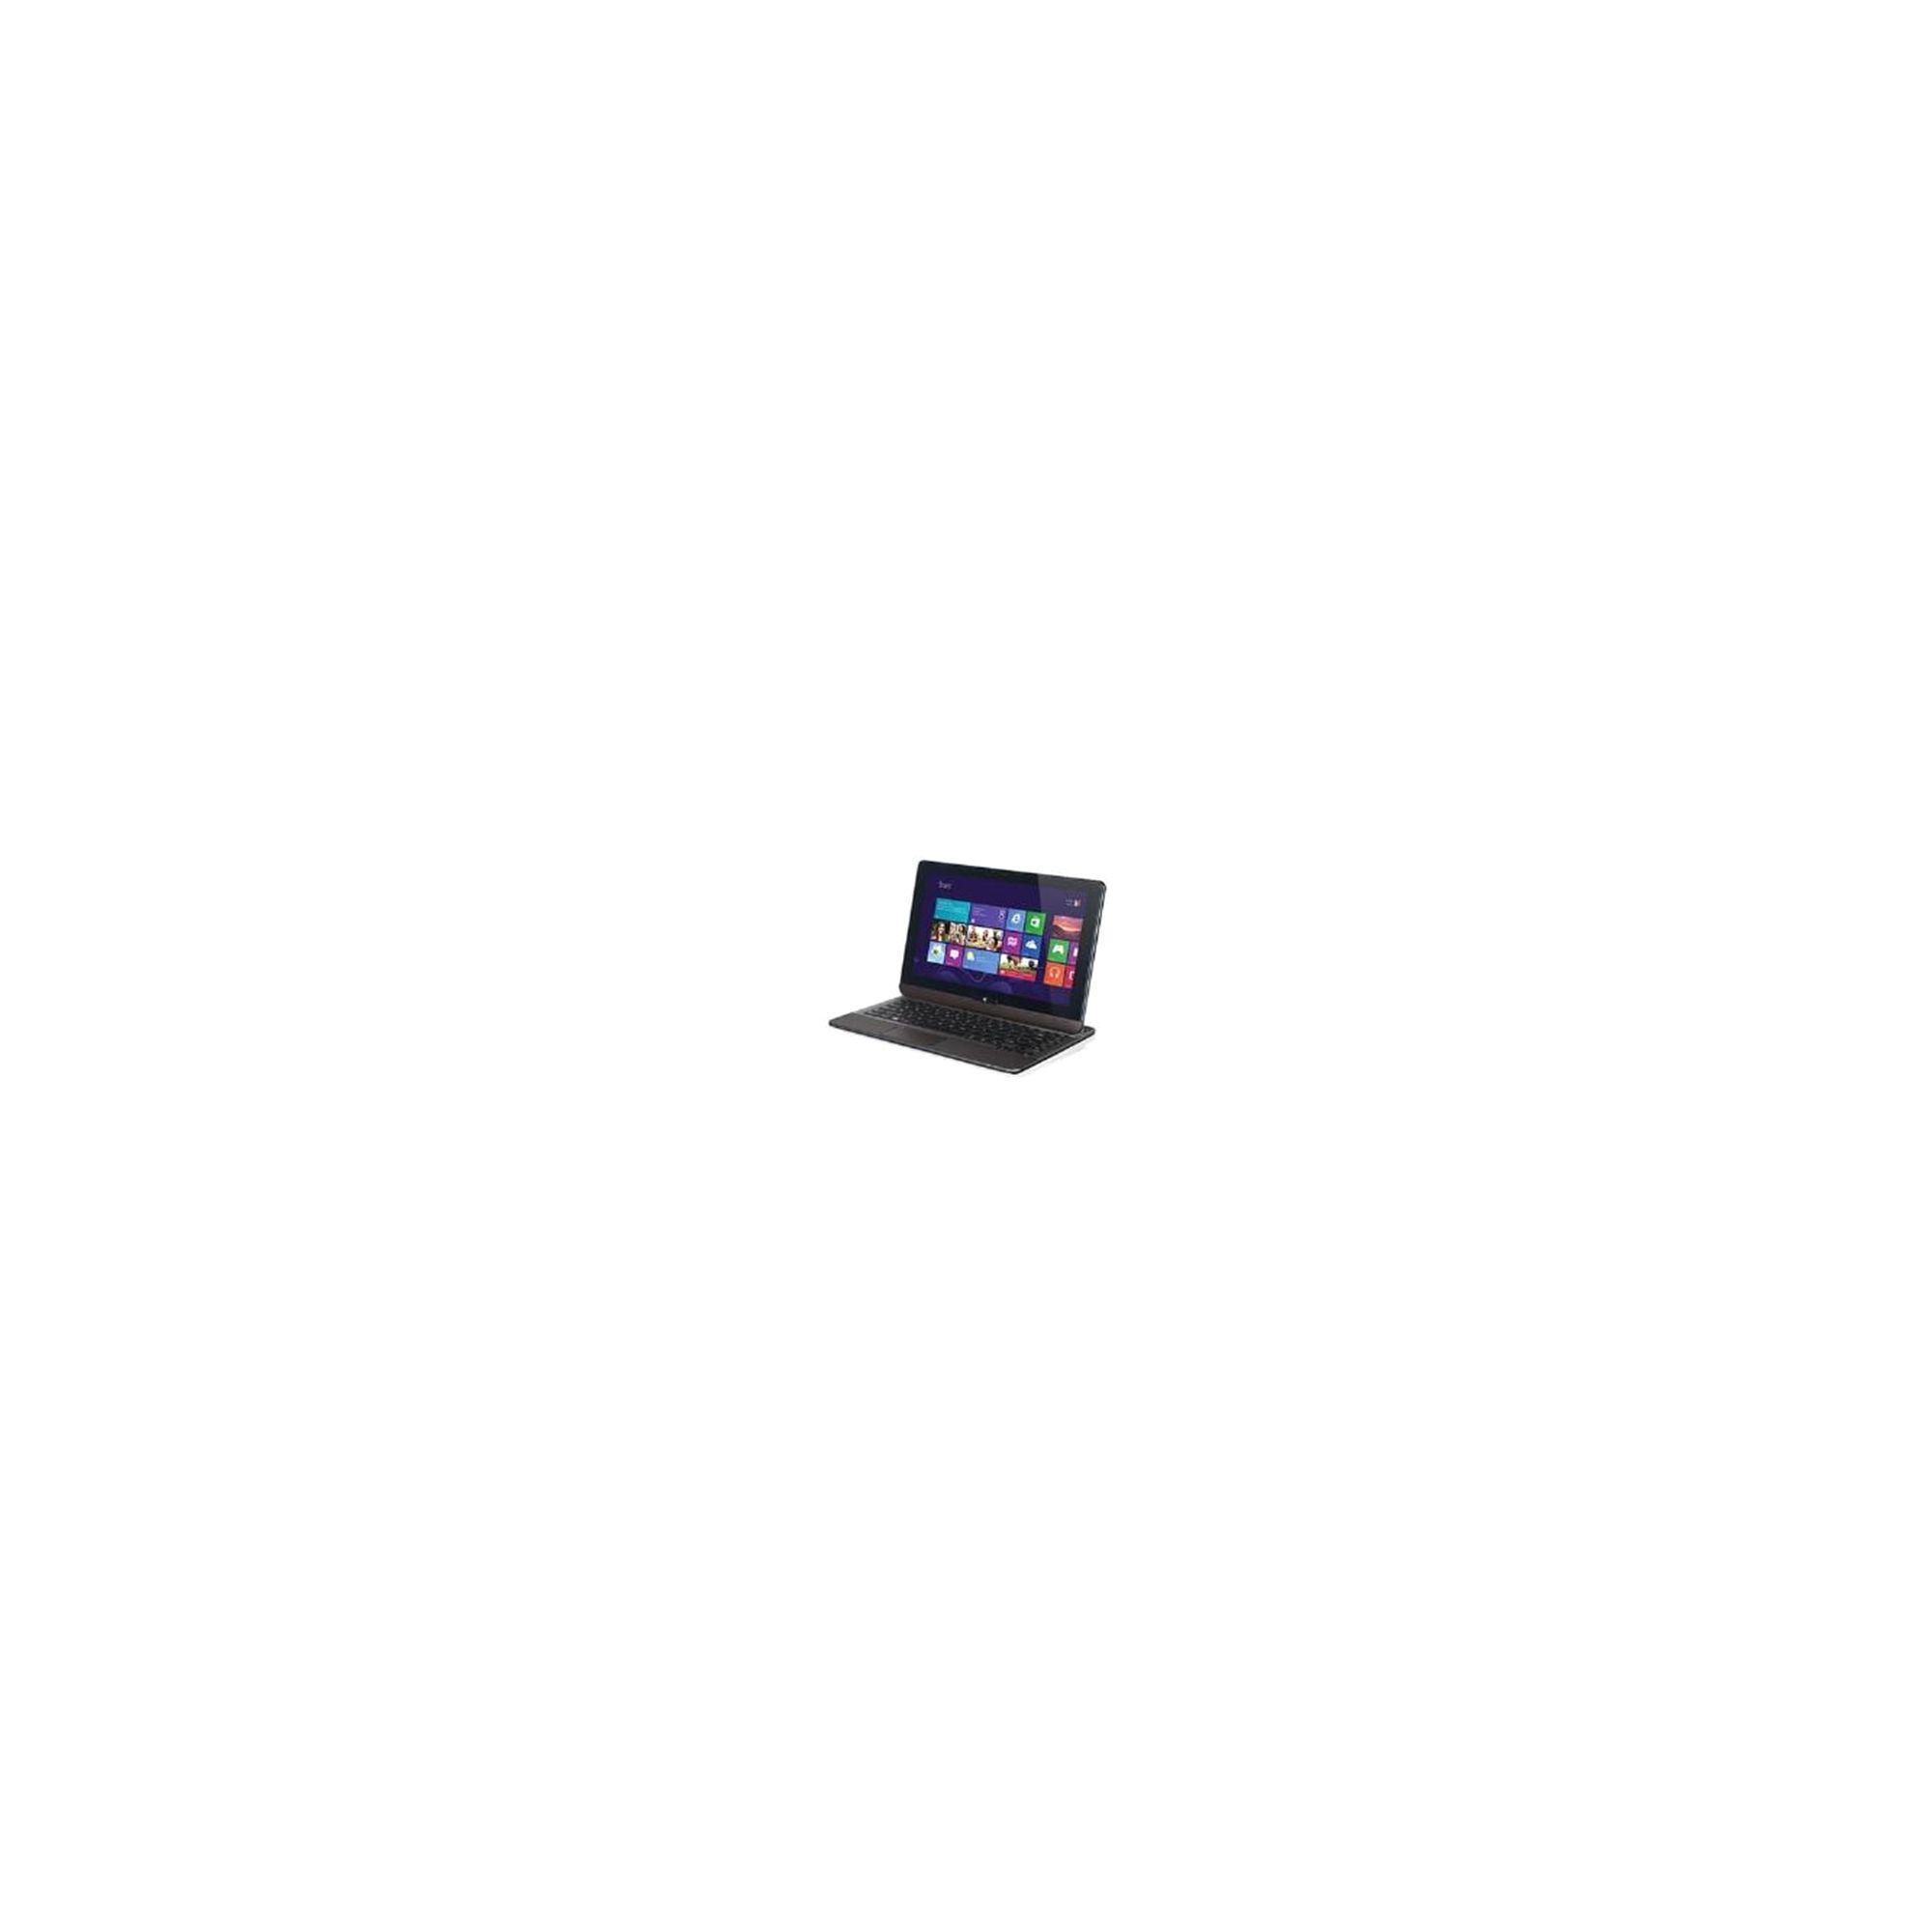 Toshiba Satellite U920T-10F (12.5 inch) Notebook Core i3 (3217U) 1.8GHz 4GB 128GB SSD WLAN BT Webcam Windows 8 64-bit (Intel HD Graphics 4000) at Tesco Direct